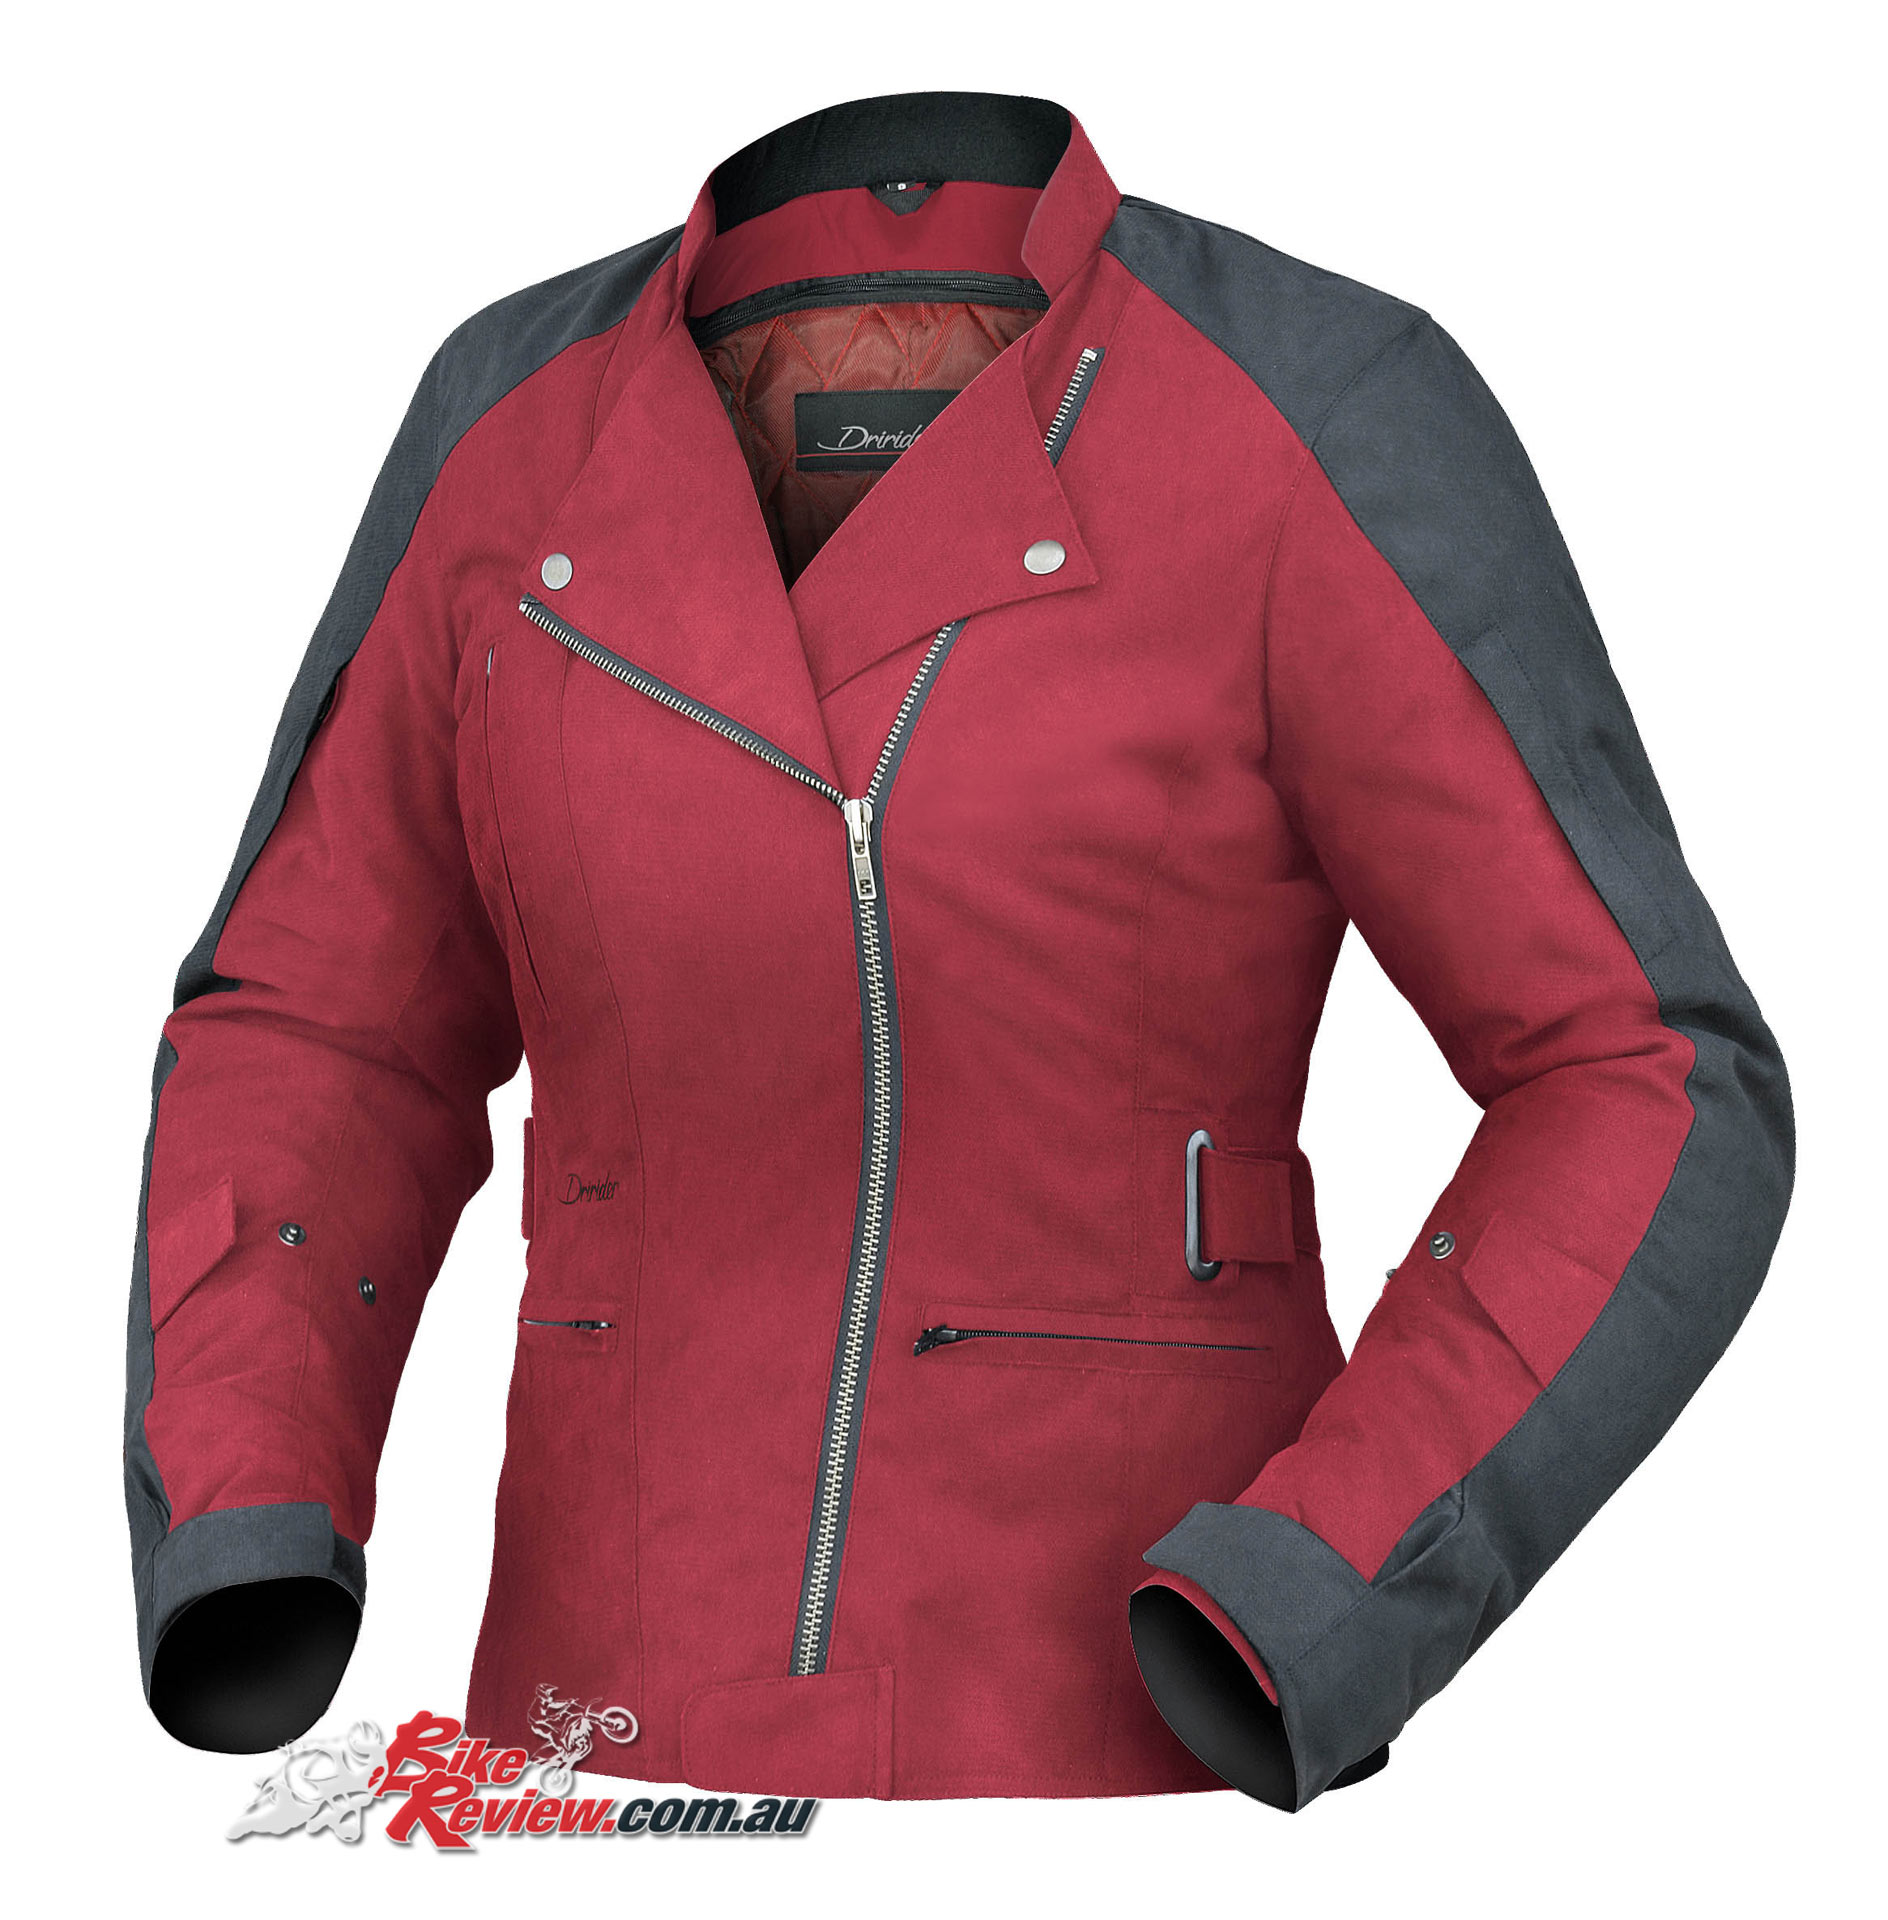 DriRider Cruise Ladies jacket